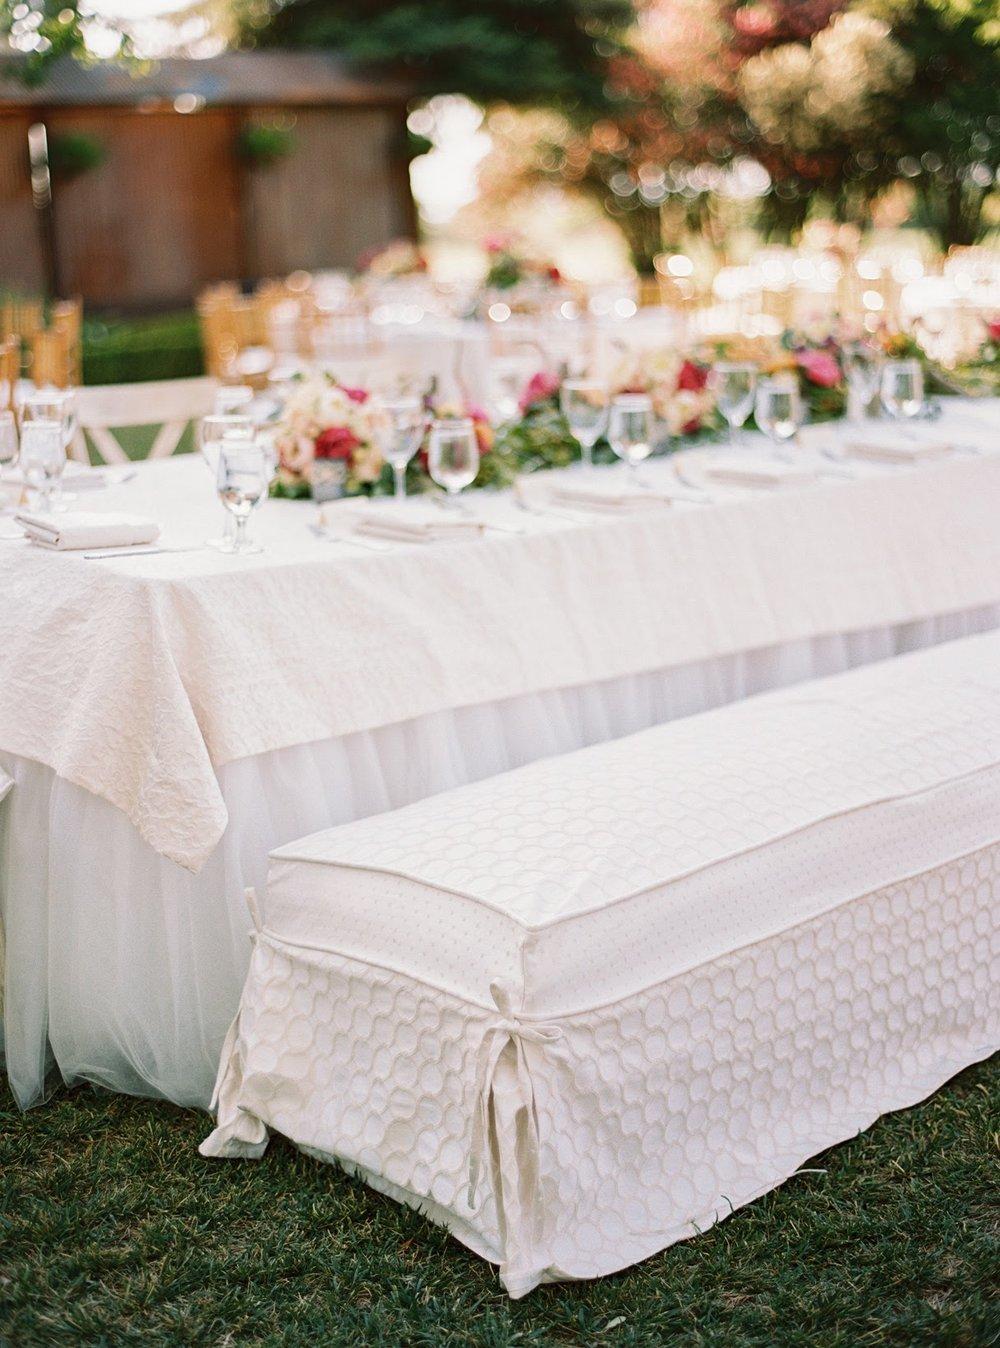 Portland_wedding_planner_Park_Winters_09.jpg